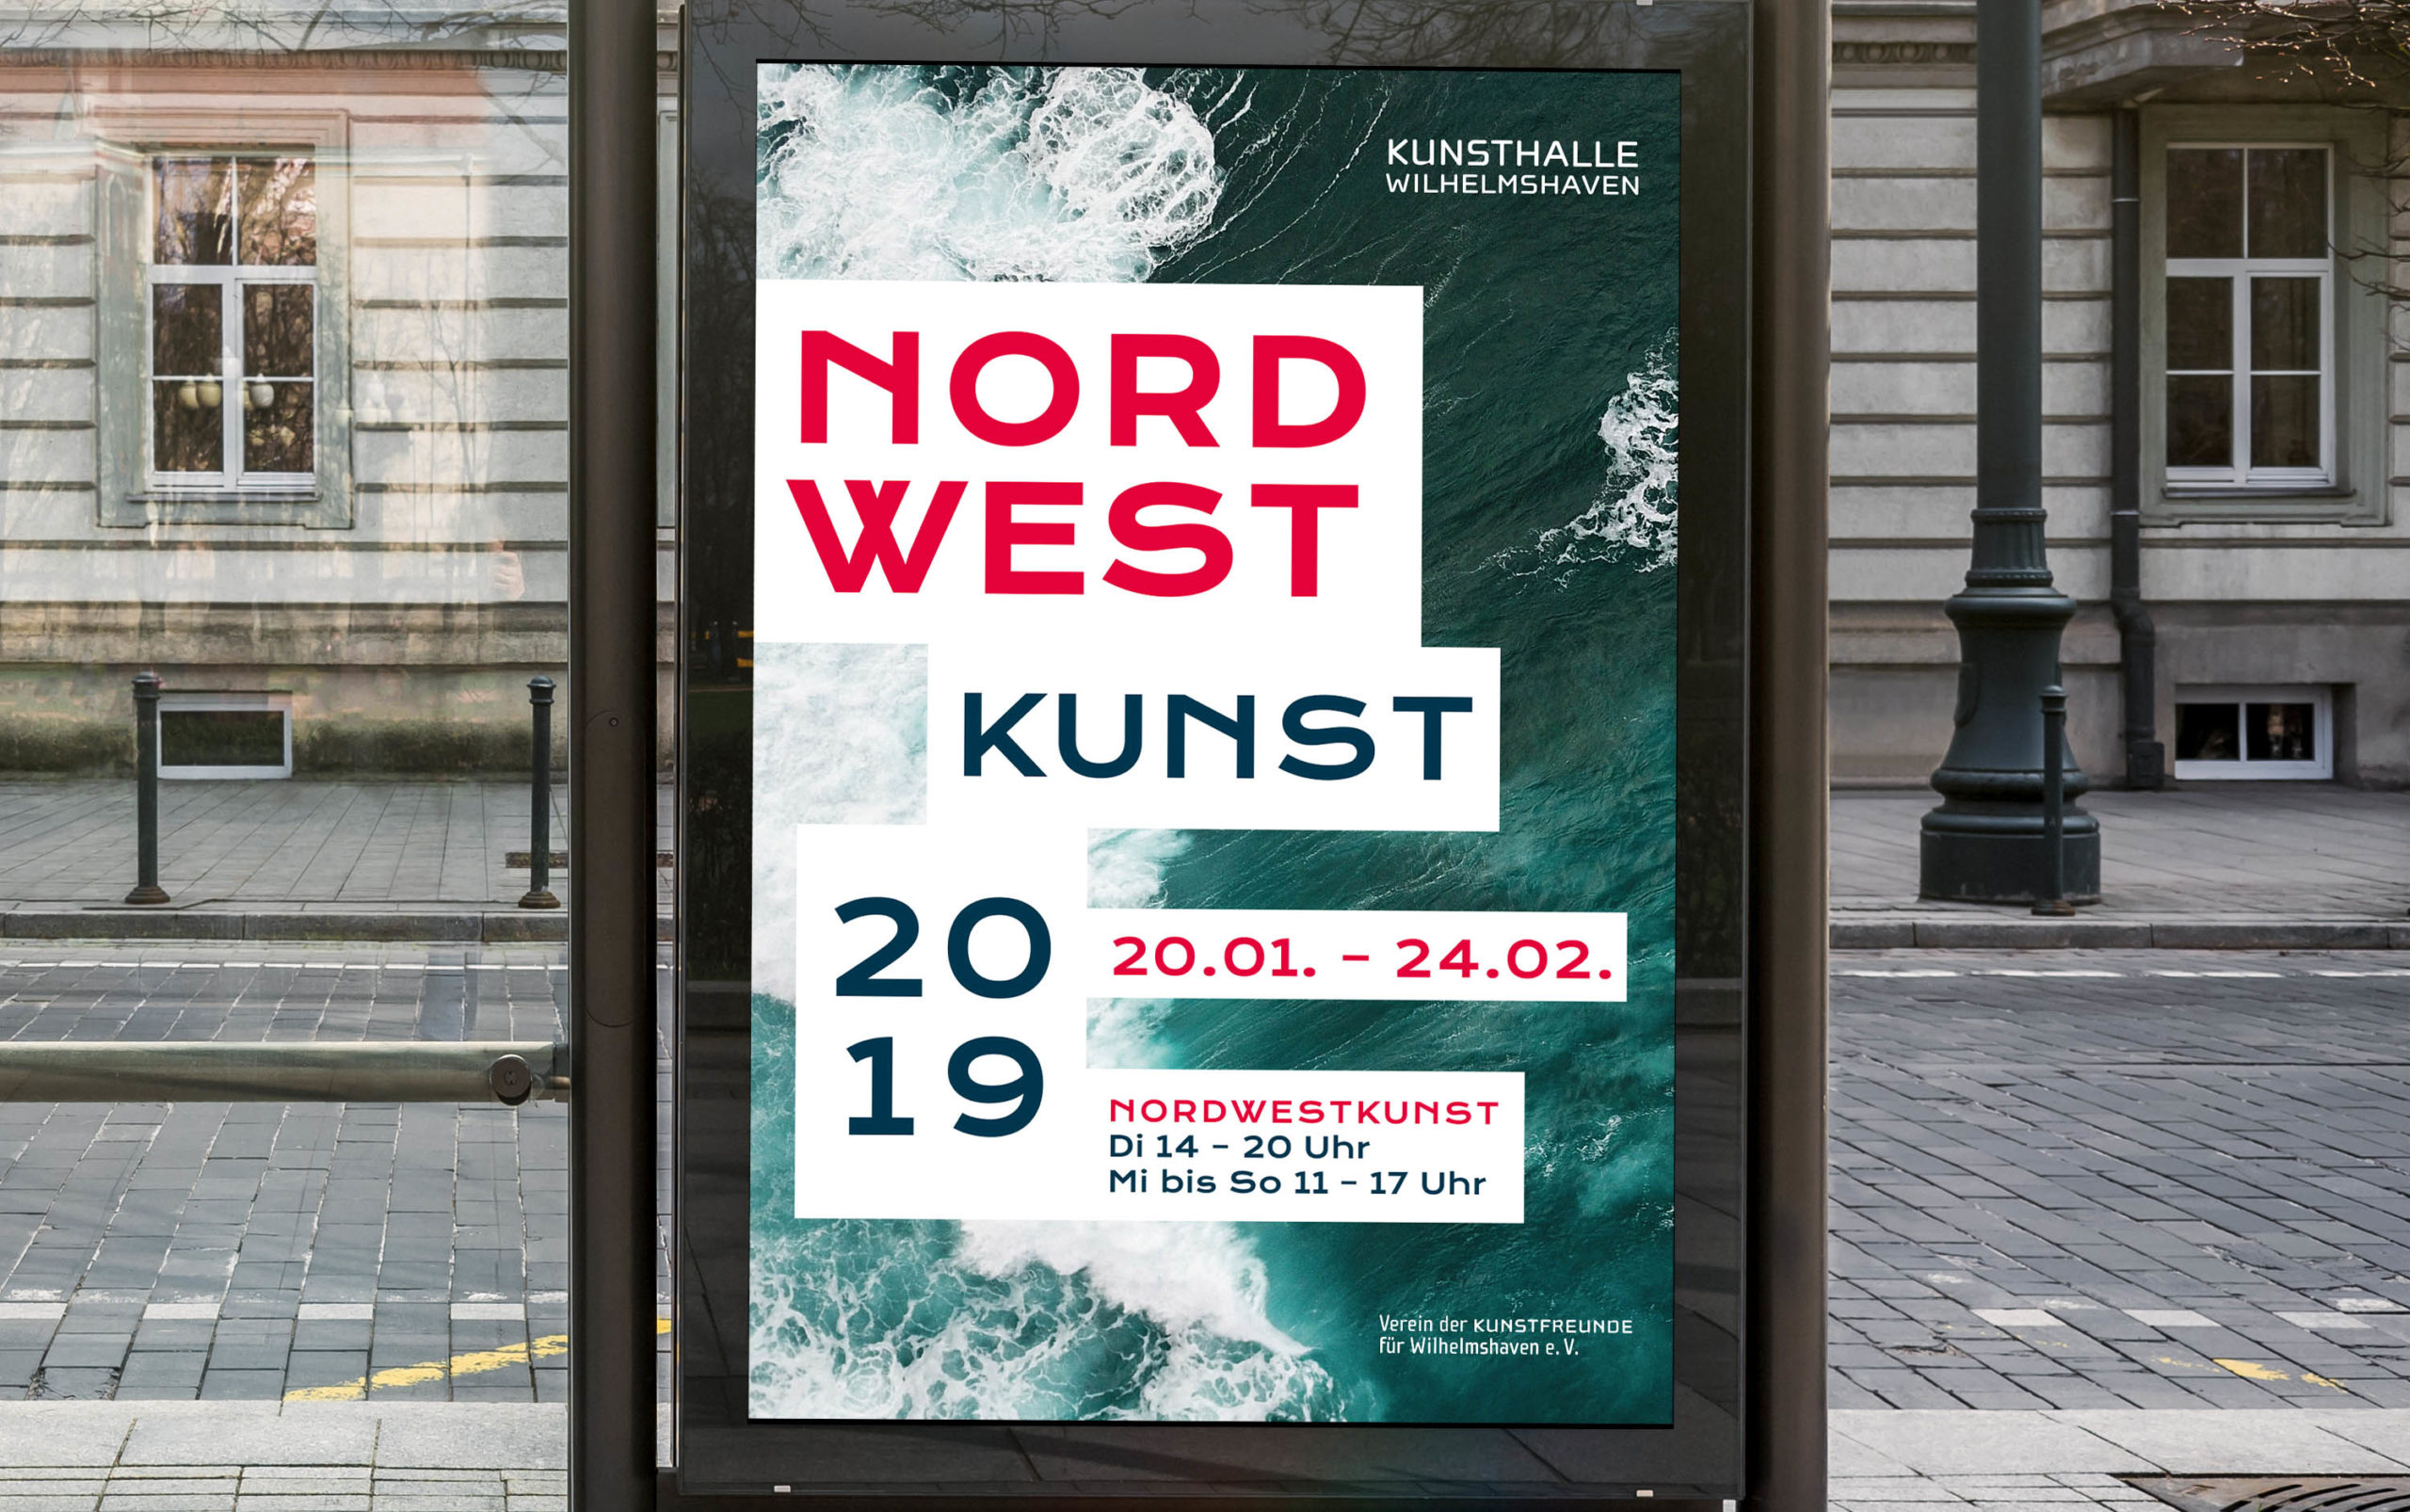 Kunsthalle-Wilhelmshaven_nordwestkunst_poster